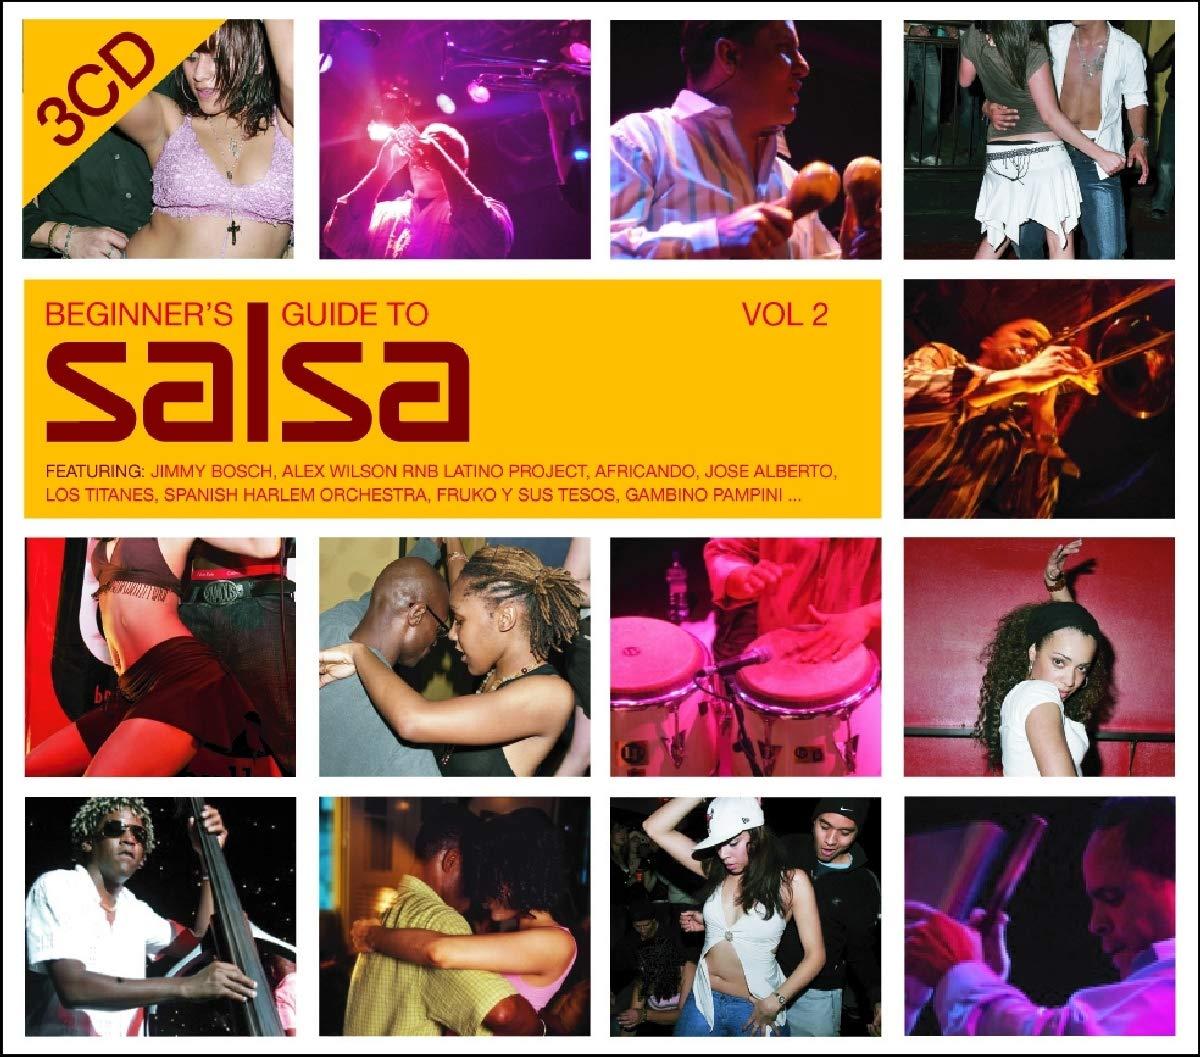 Beginner's Guide to 2 Salsa Spasm price 5 popular